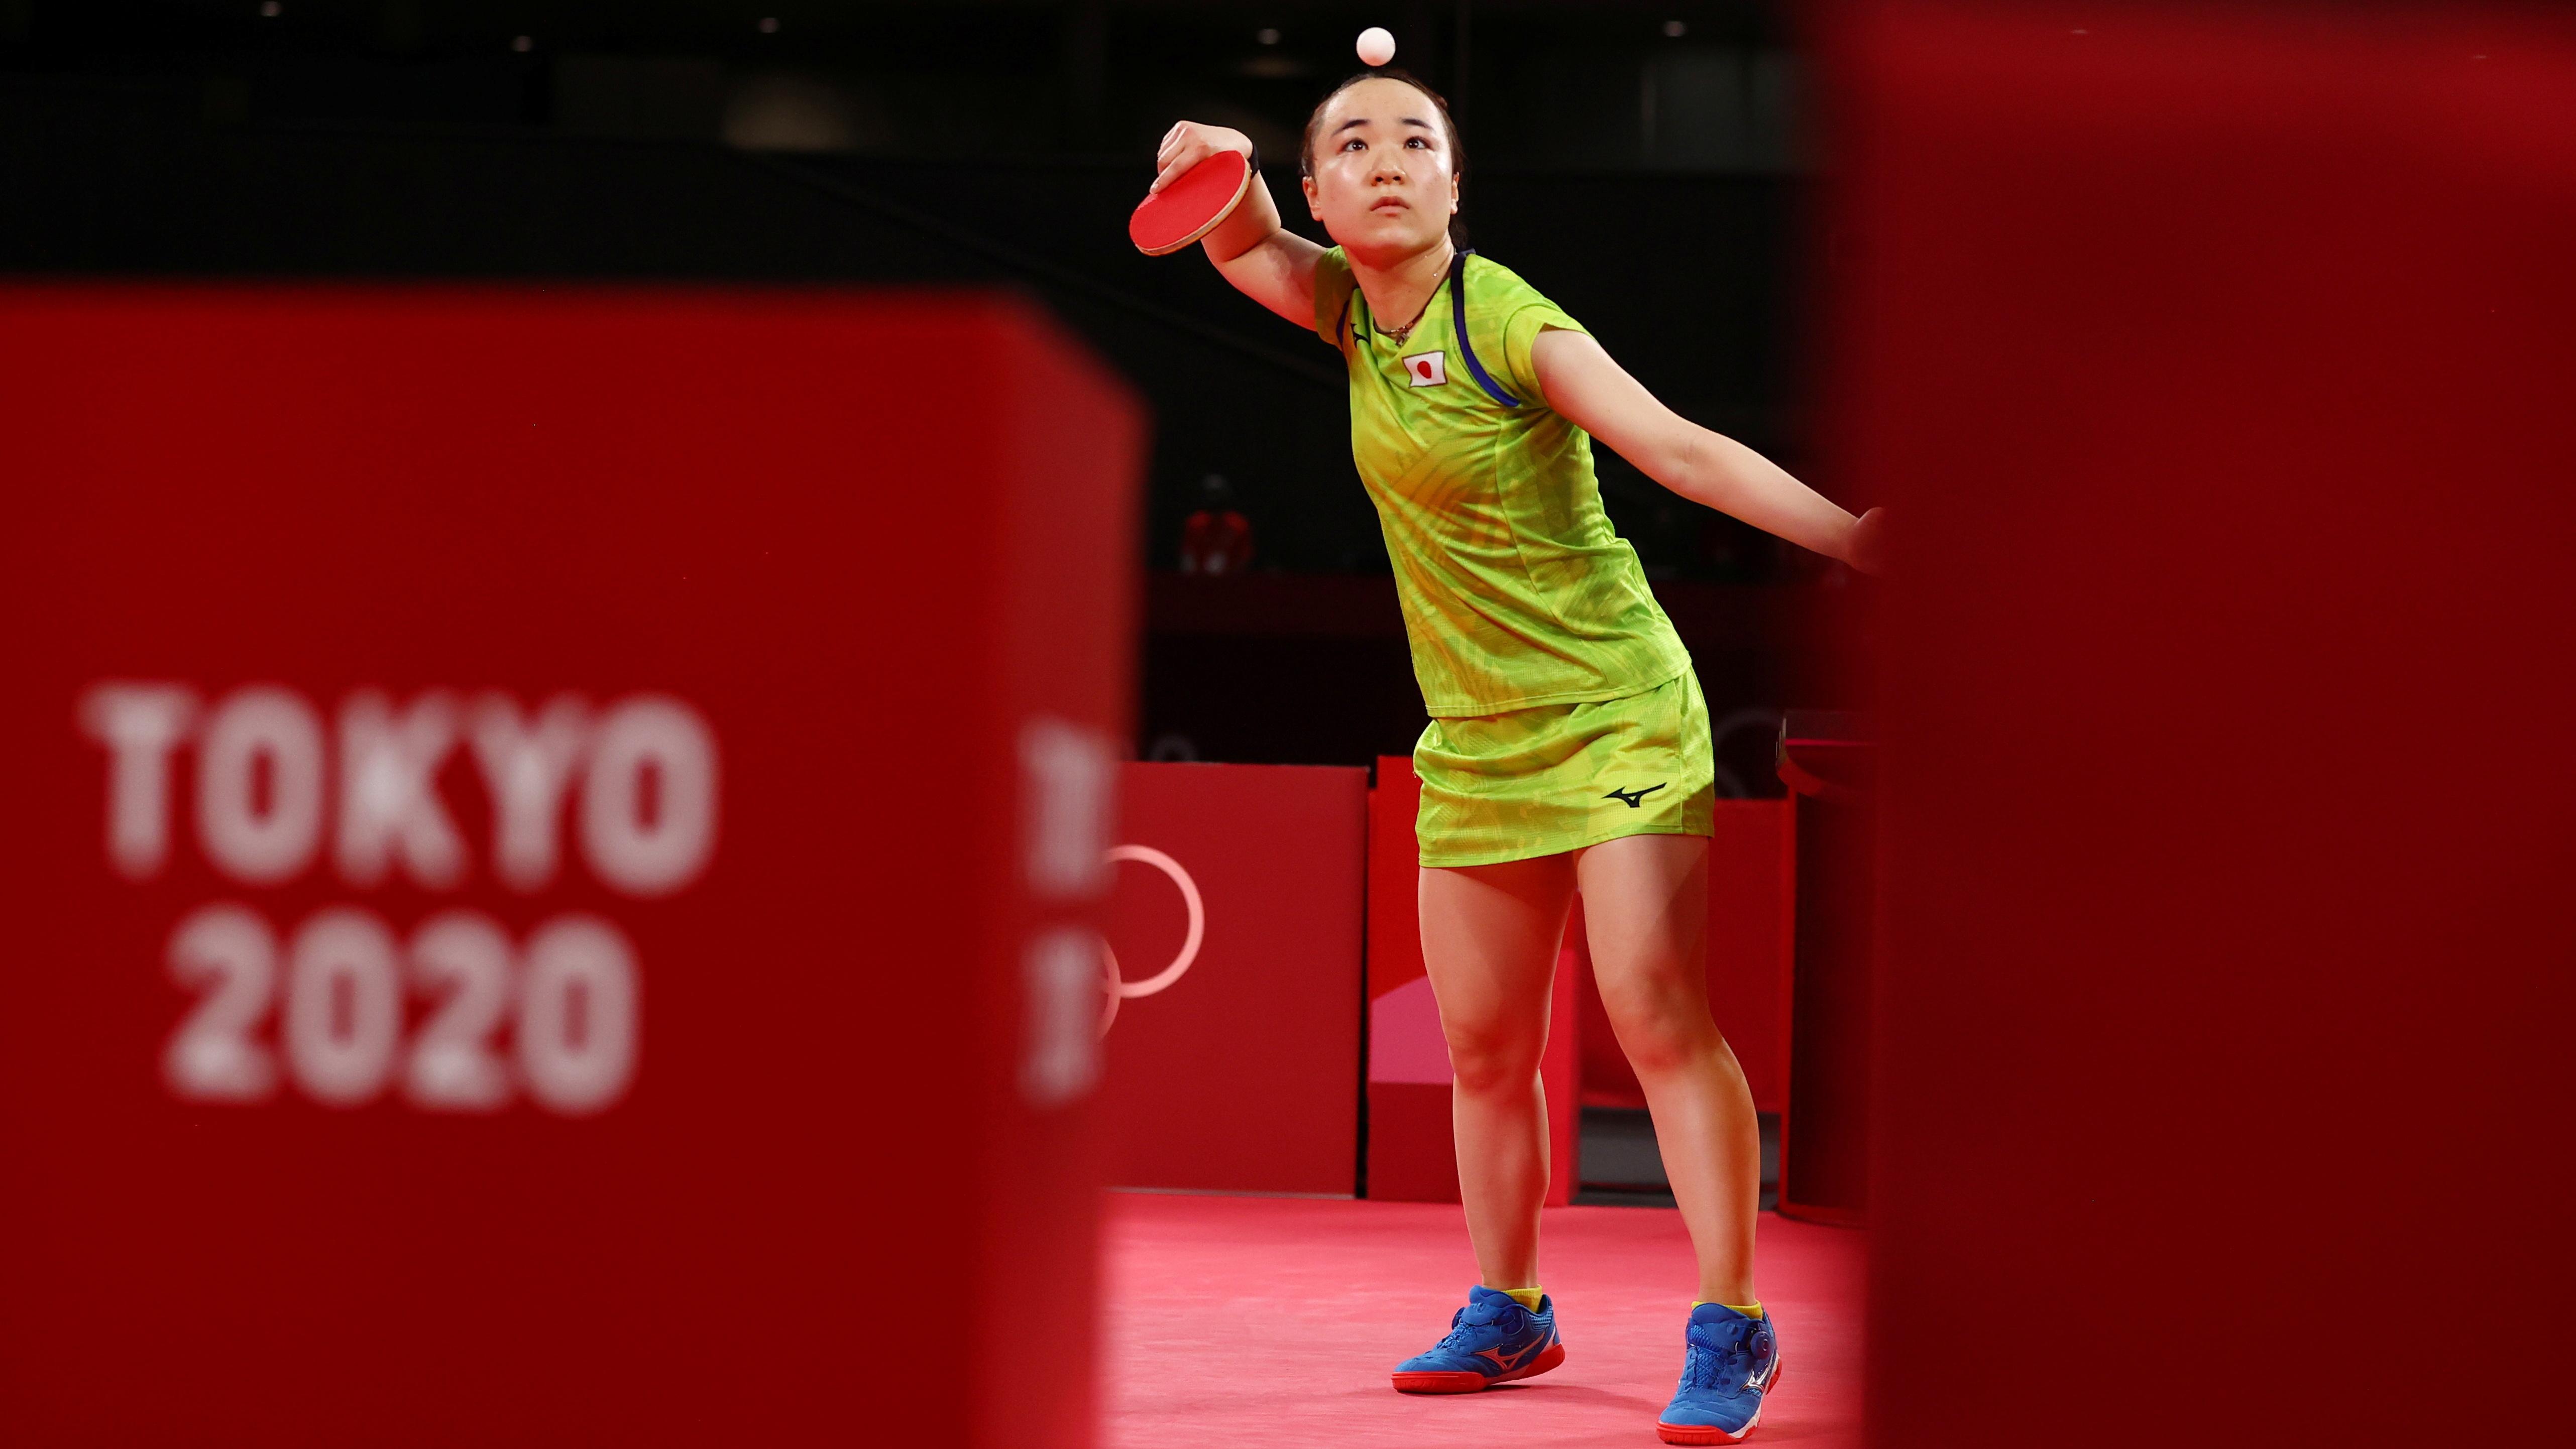 Tokyo 2020 Olympics - Table Tennis - Women's Singles - Semifinal - Tokyo Metropolitan Gymnasium - Tokyo, Japan - July 29, 2021. Mima Ito of Japan in action against Sun Yingsha of China REUTERS/Thomas Peter